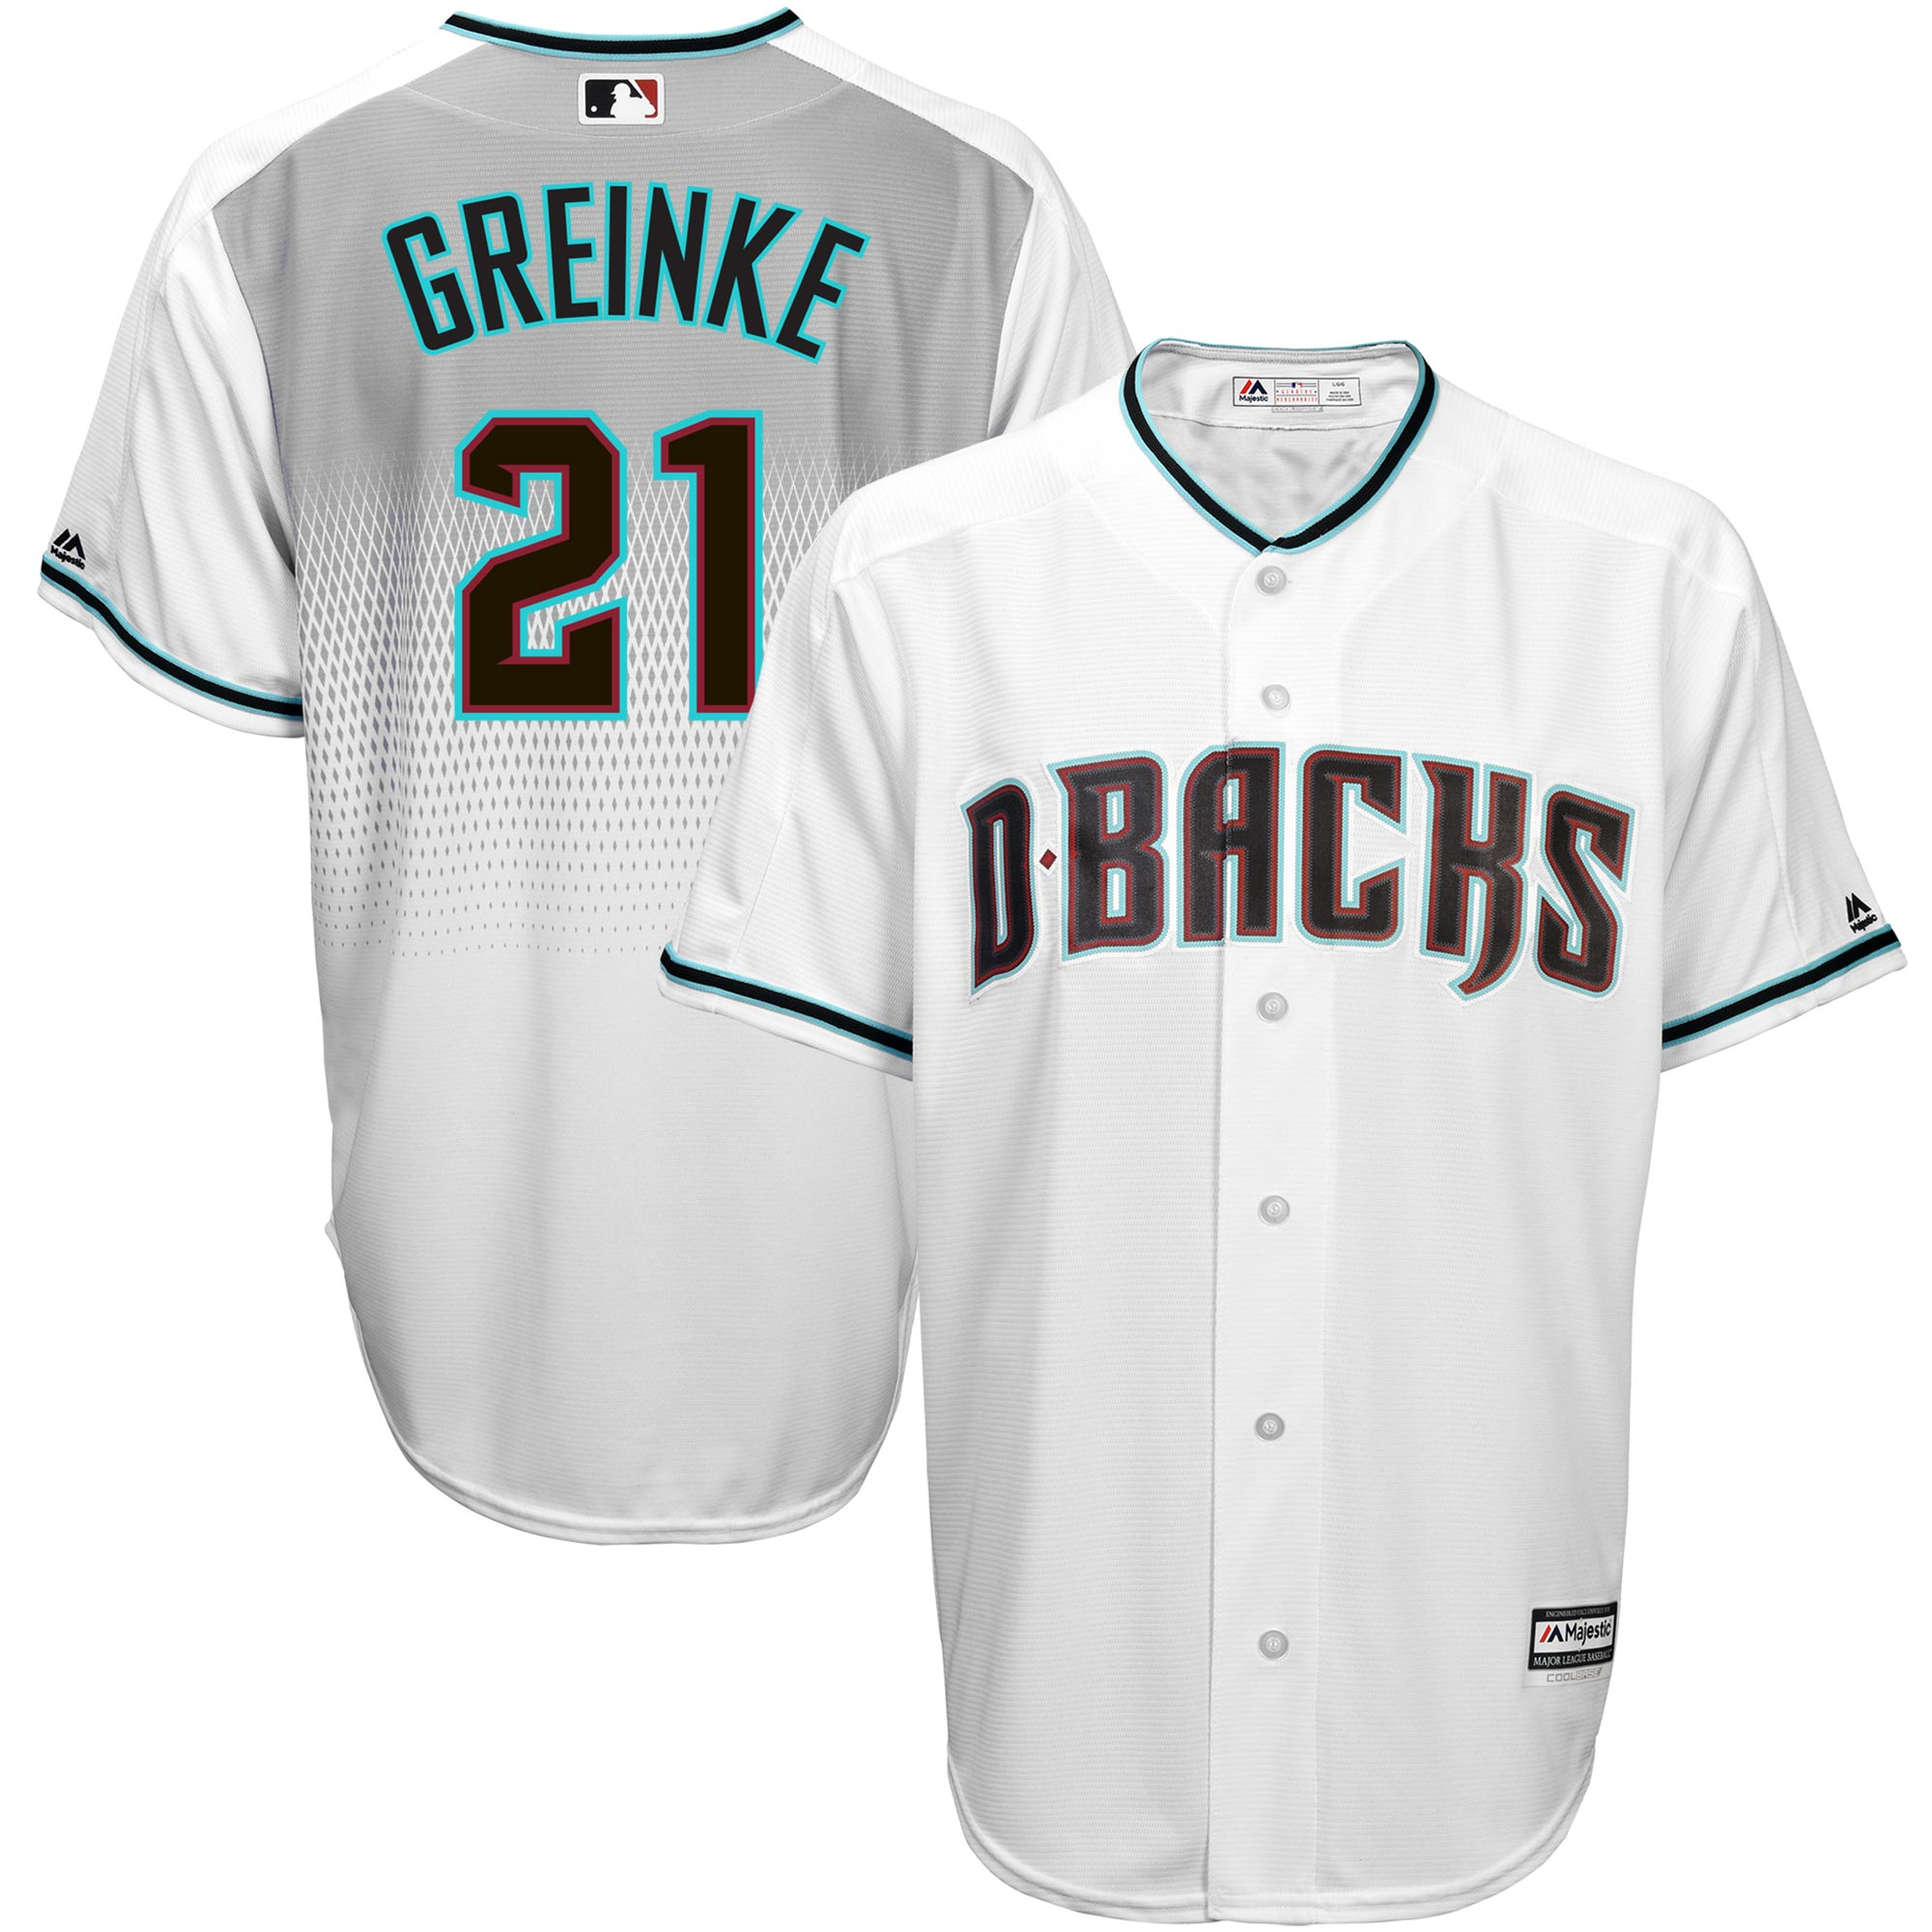 Zack Greinke Arizona Diamondbacks Majestic Home Cool Base Player Jersey - White/Teal